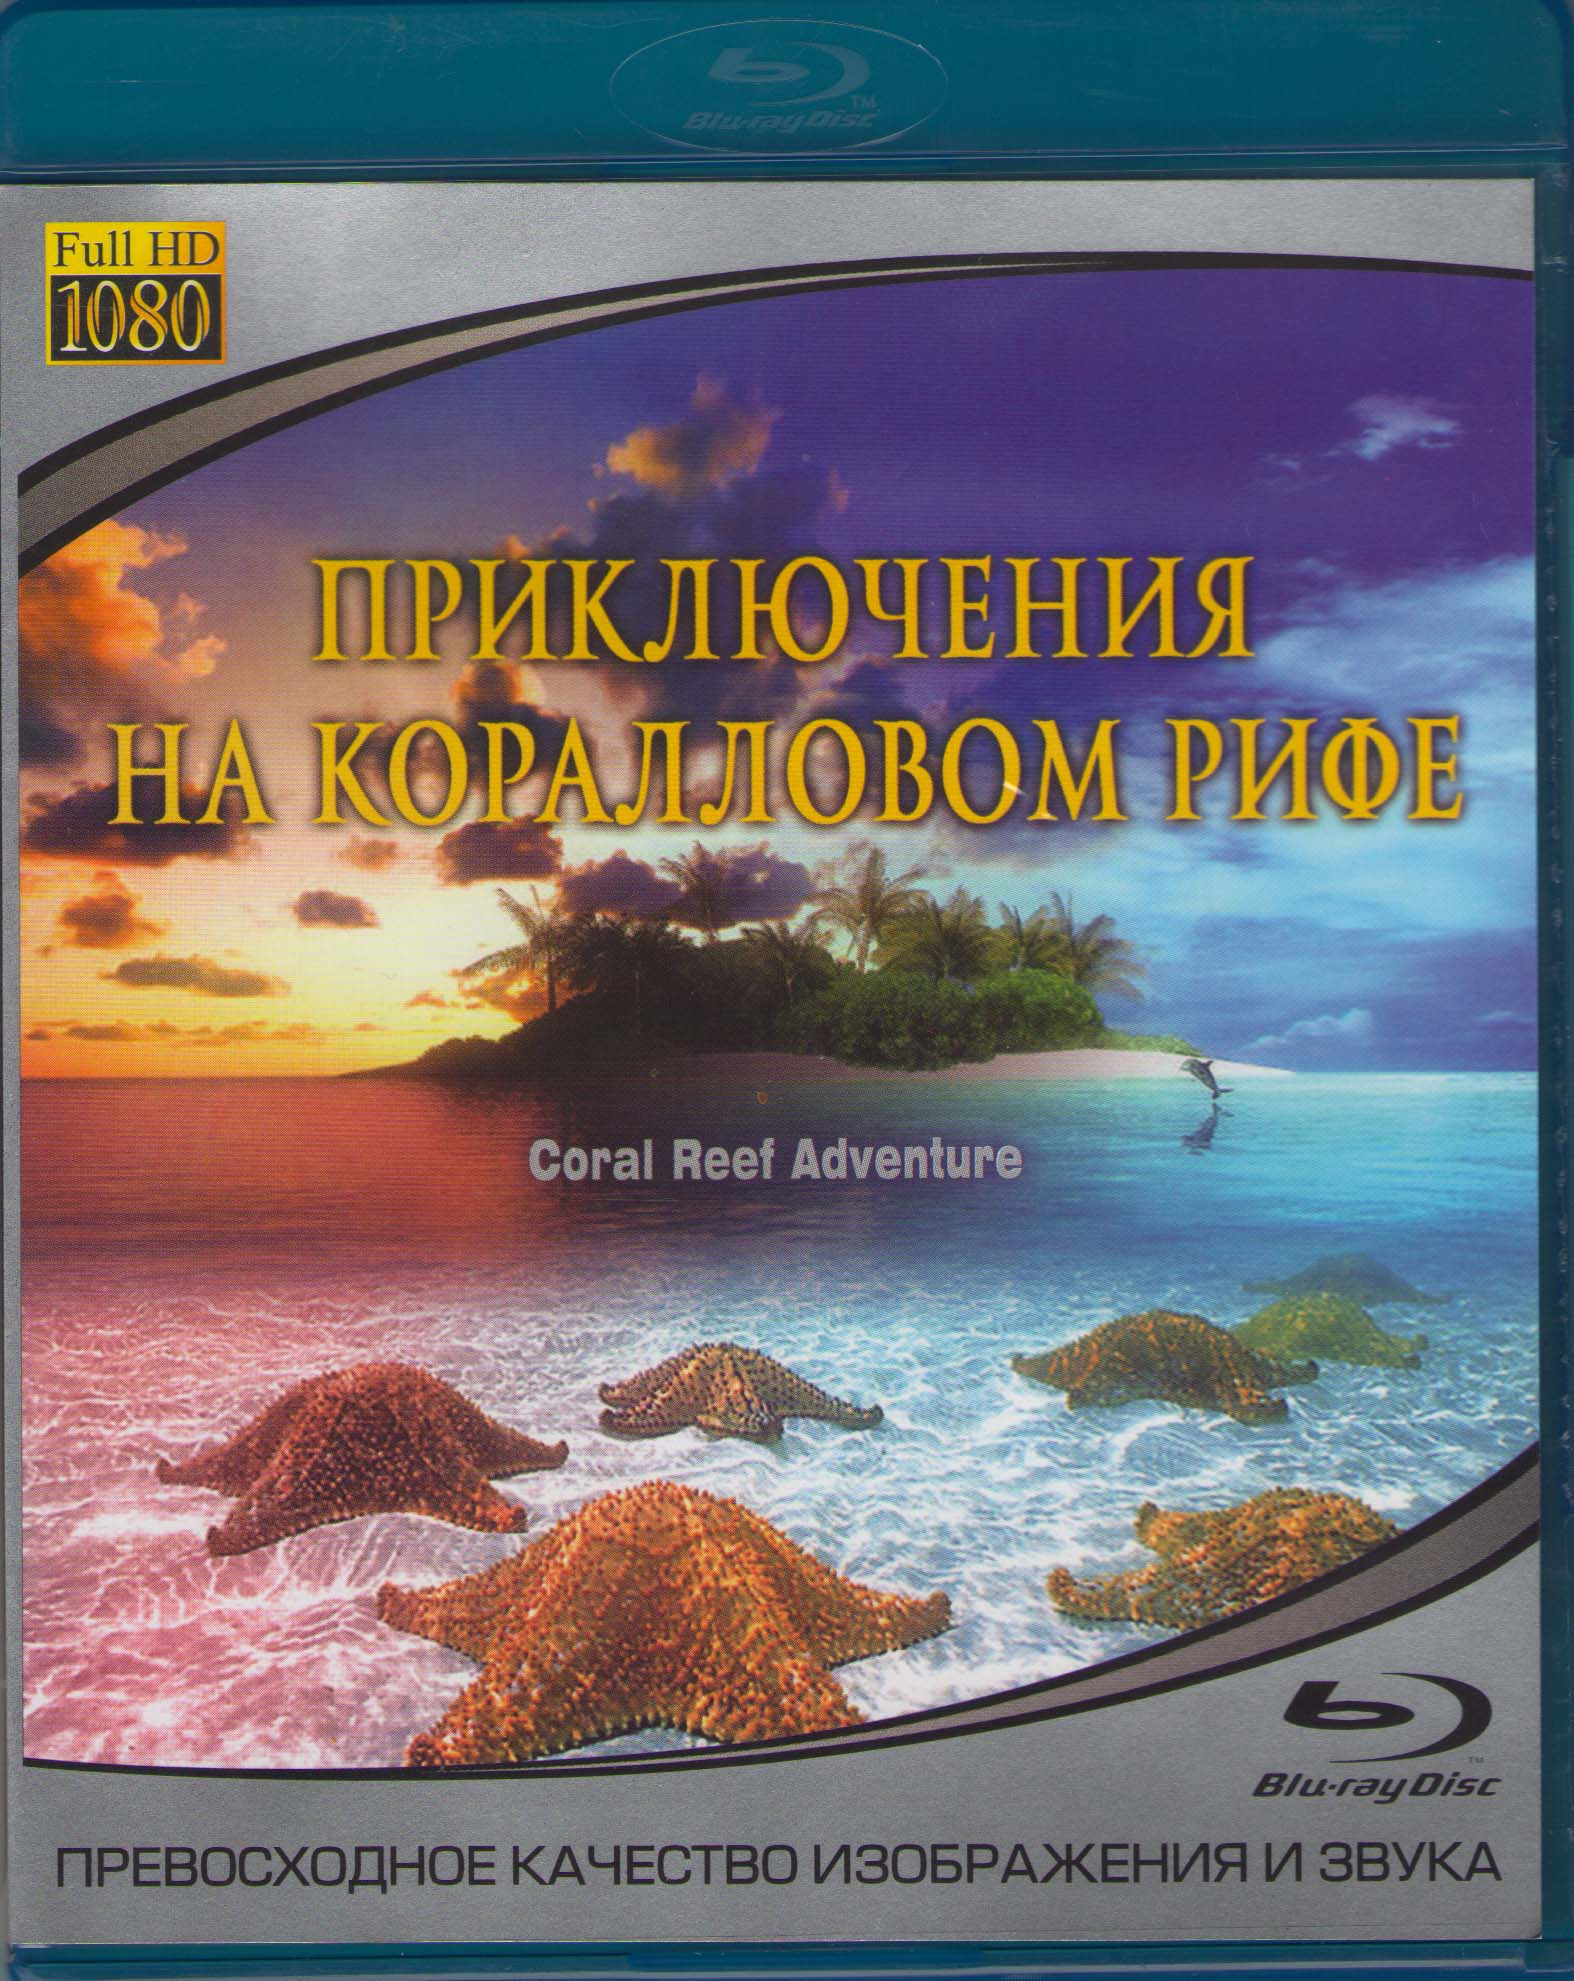 Приключения на коралловом рифе (Blu-ray)